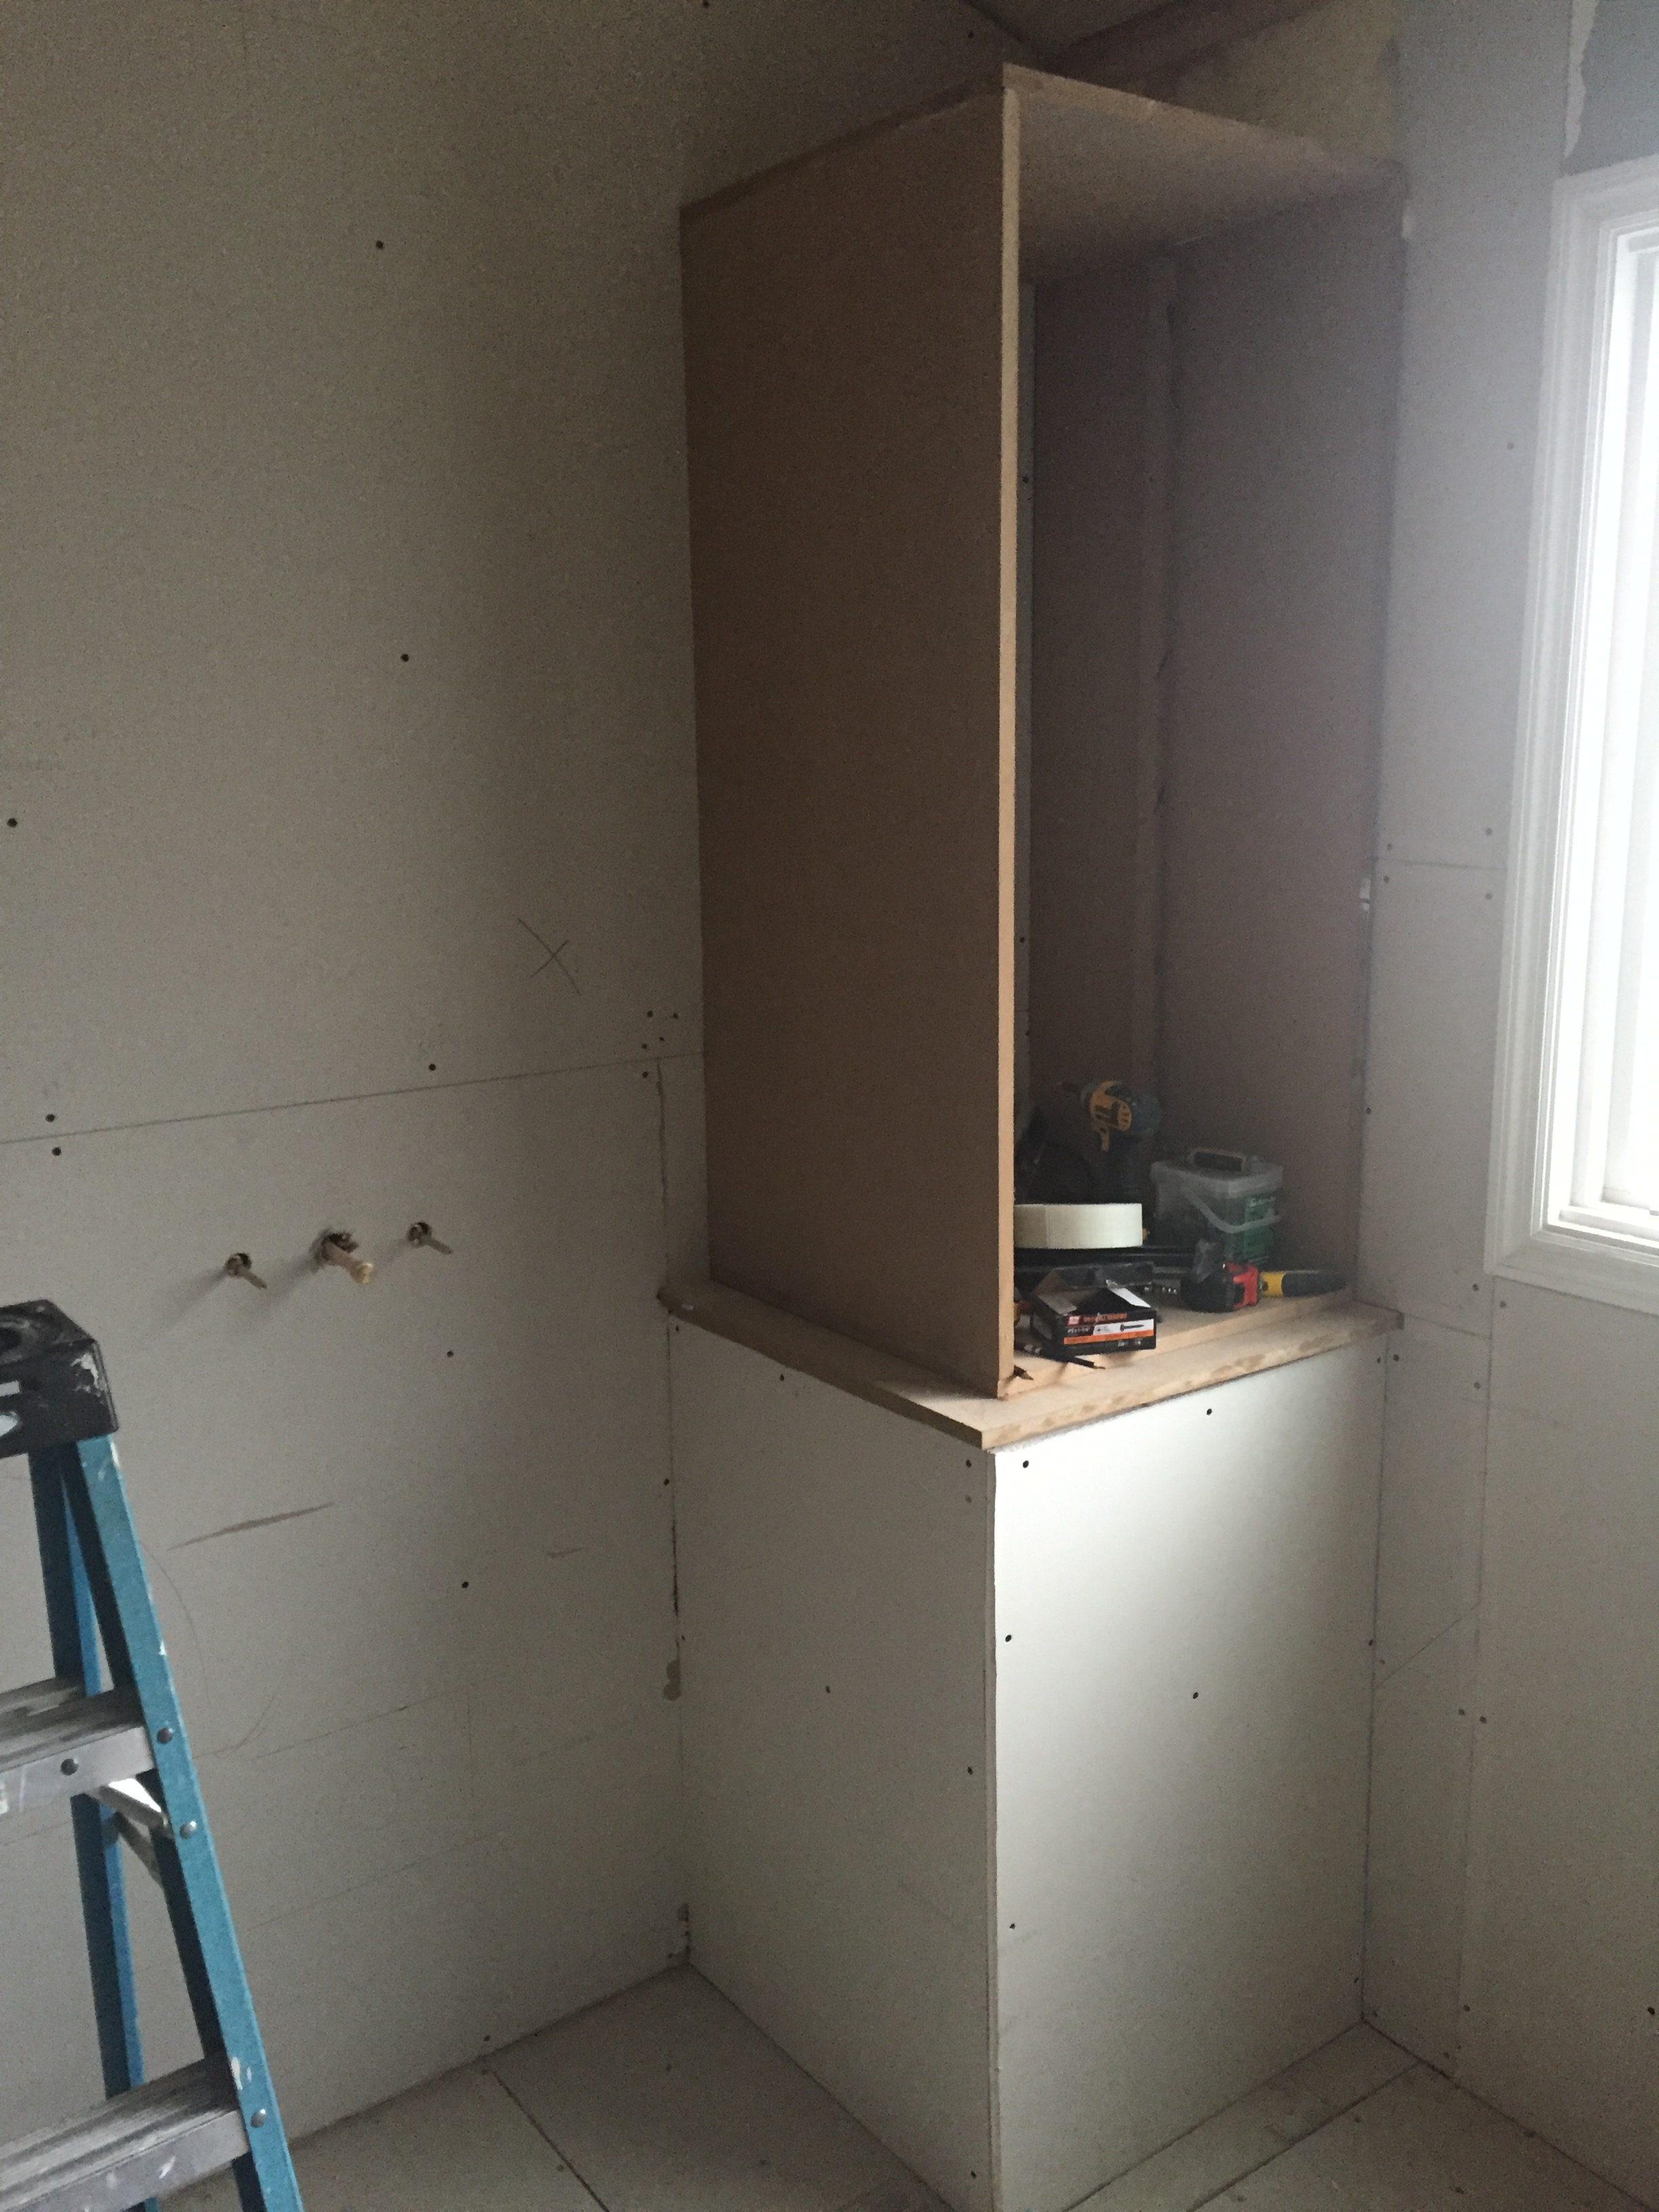 Farmhouse Bath Renovation- bath updates- bath renovations- master bath- farmhouse style bath- master bathroom updates